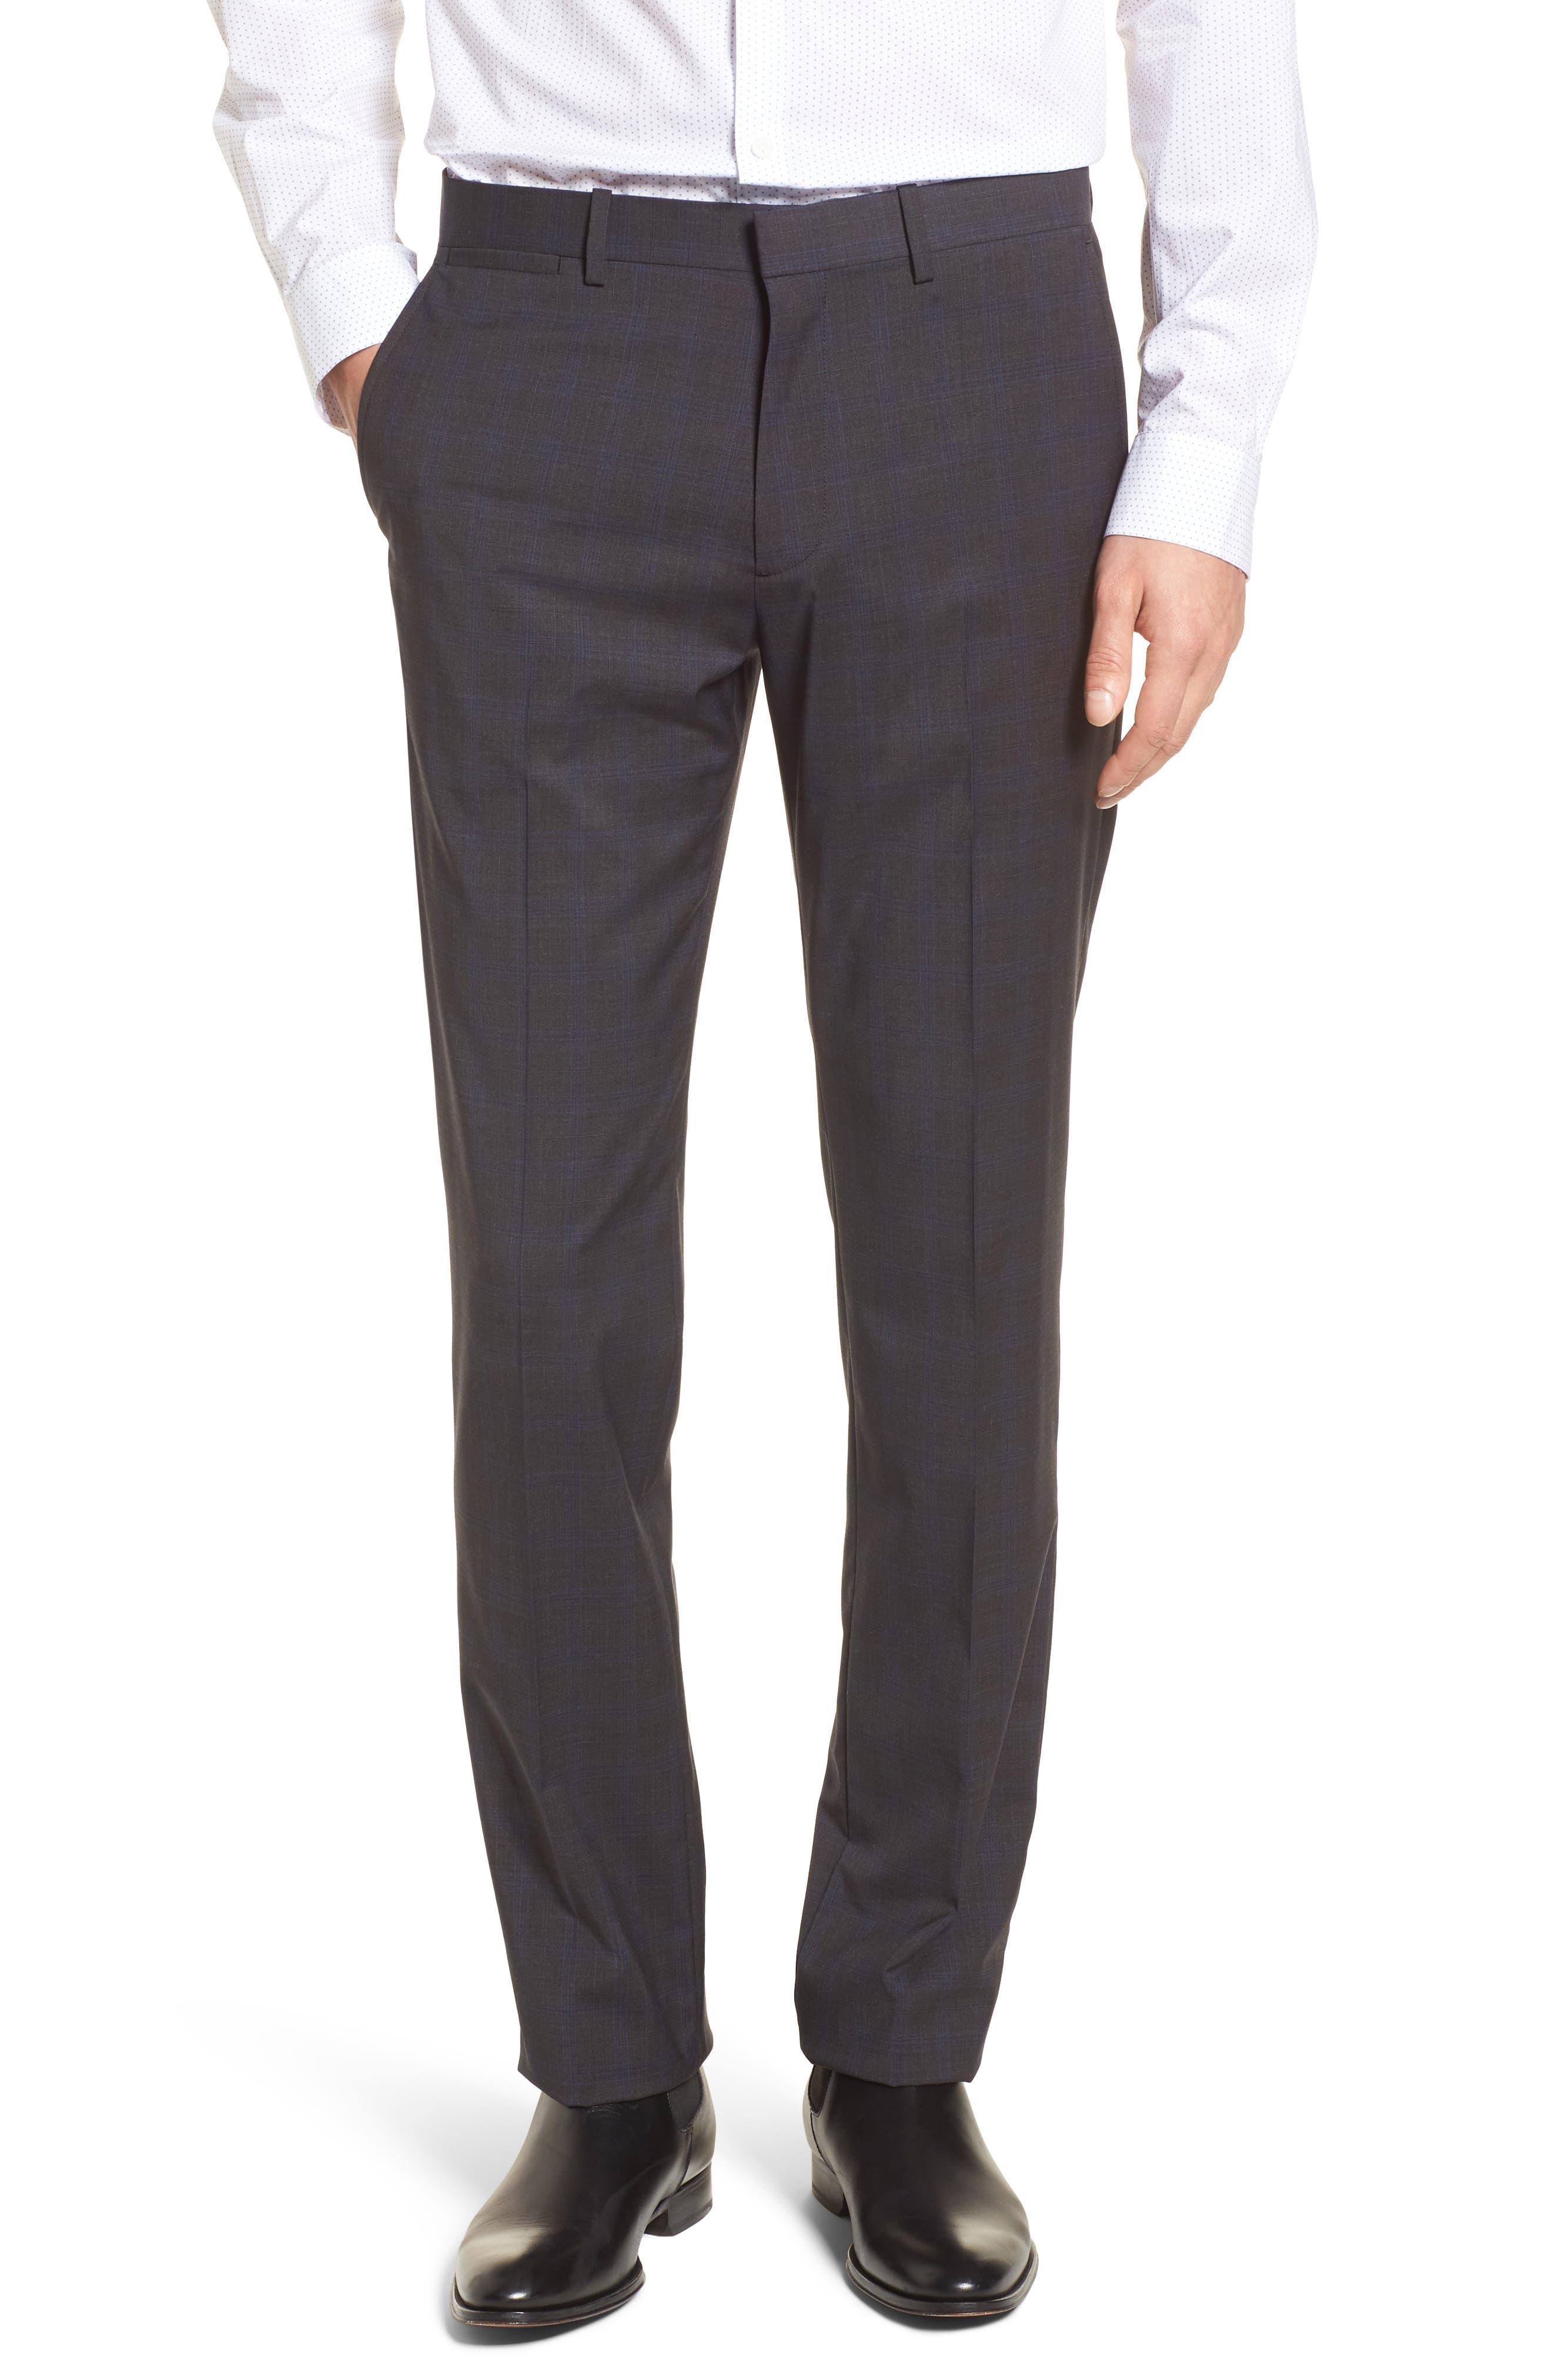 Marlo Trim Fit Tonal Plaid Trousers,                         Main,                         color, 053